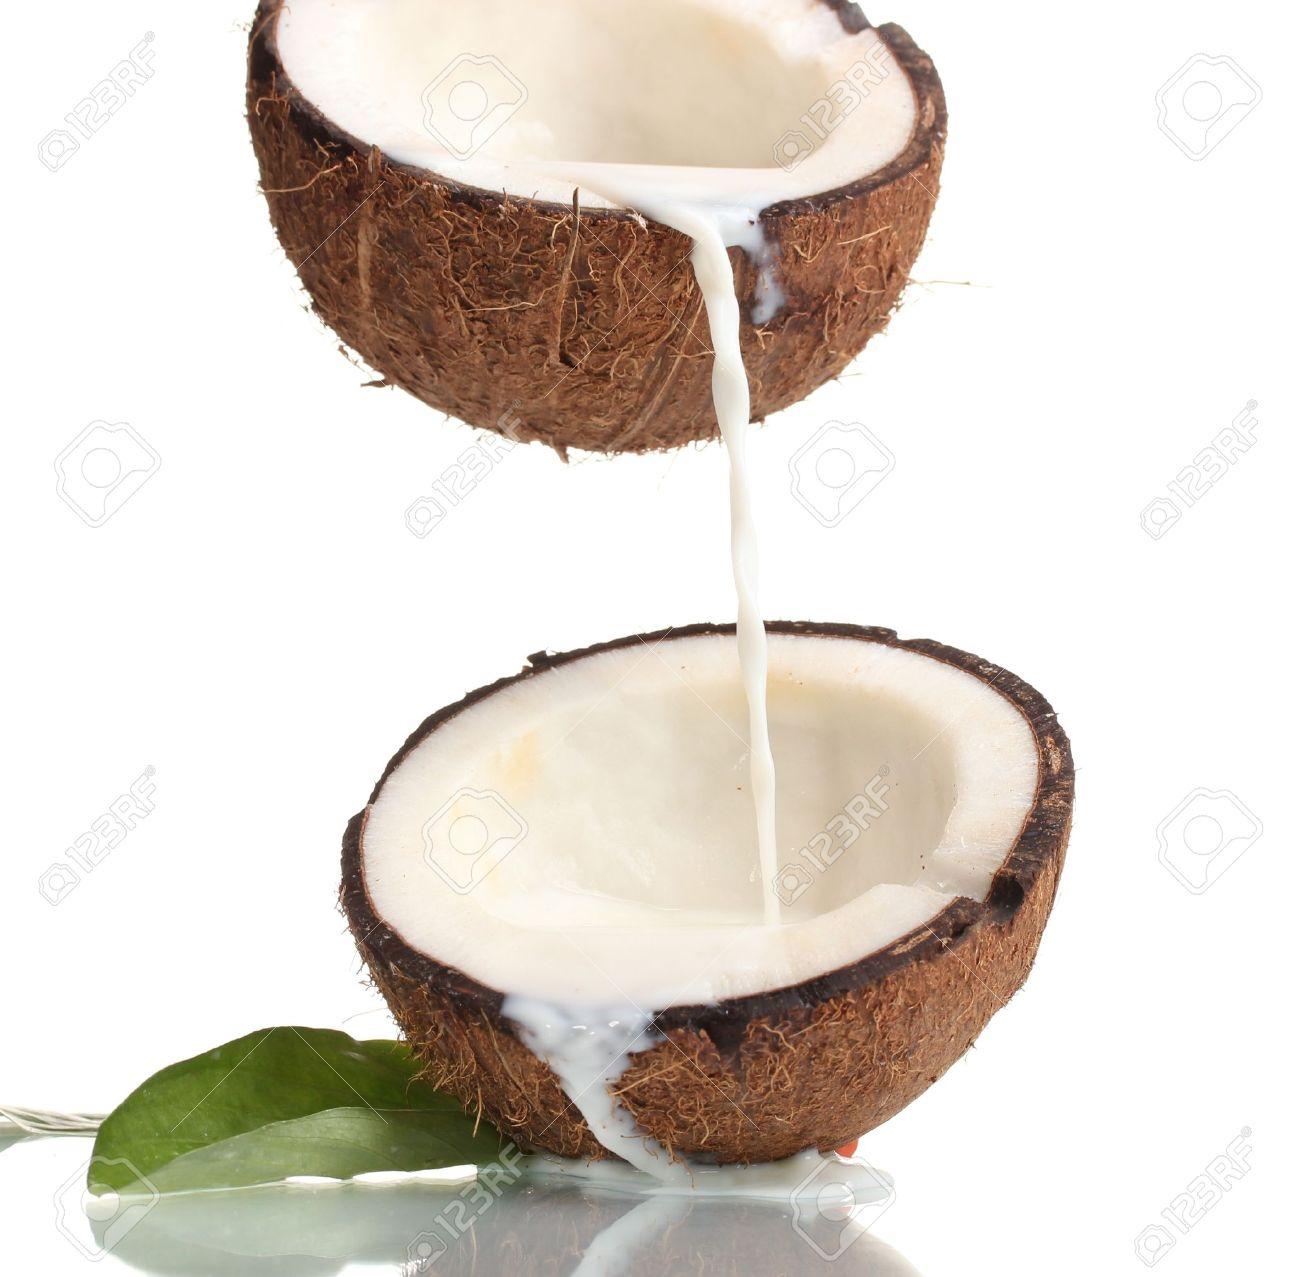 Coconut milk clipart.